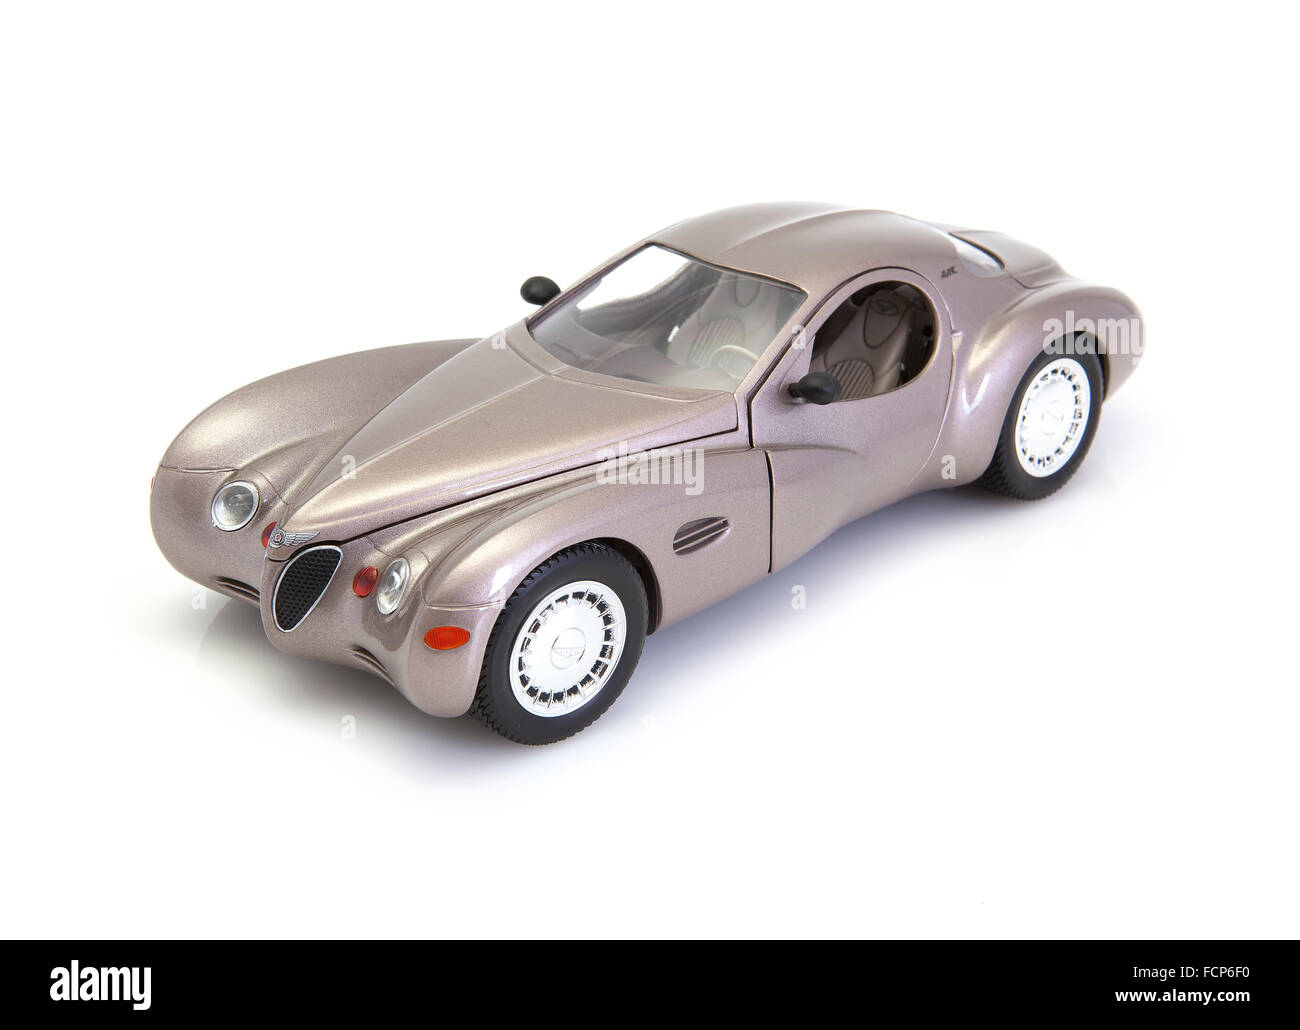 Chrysler Atlantic Concept Car Model on a White background Stock Photo